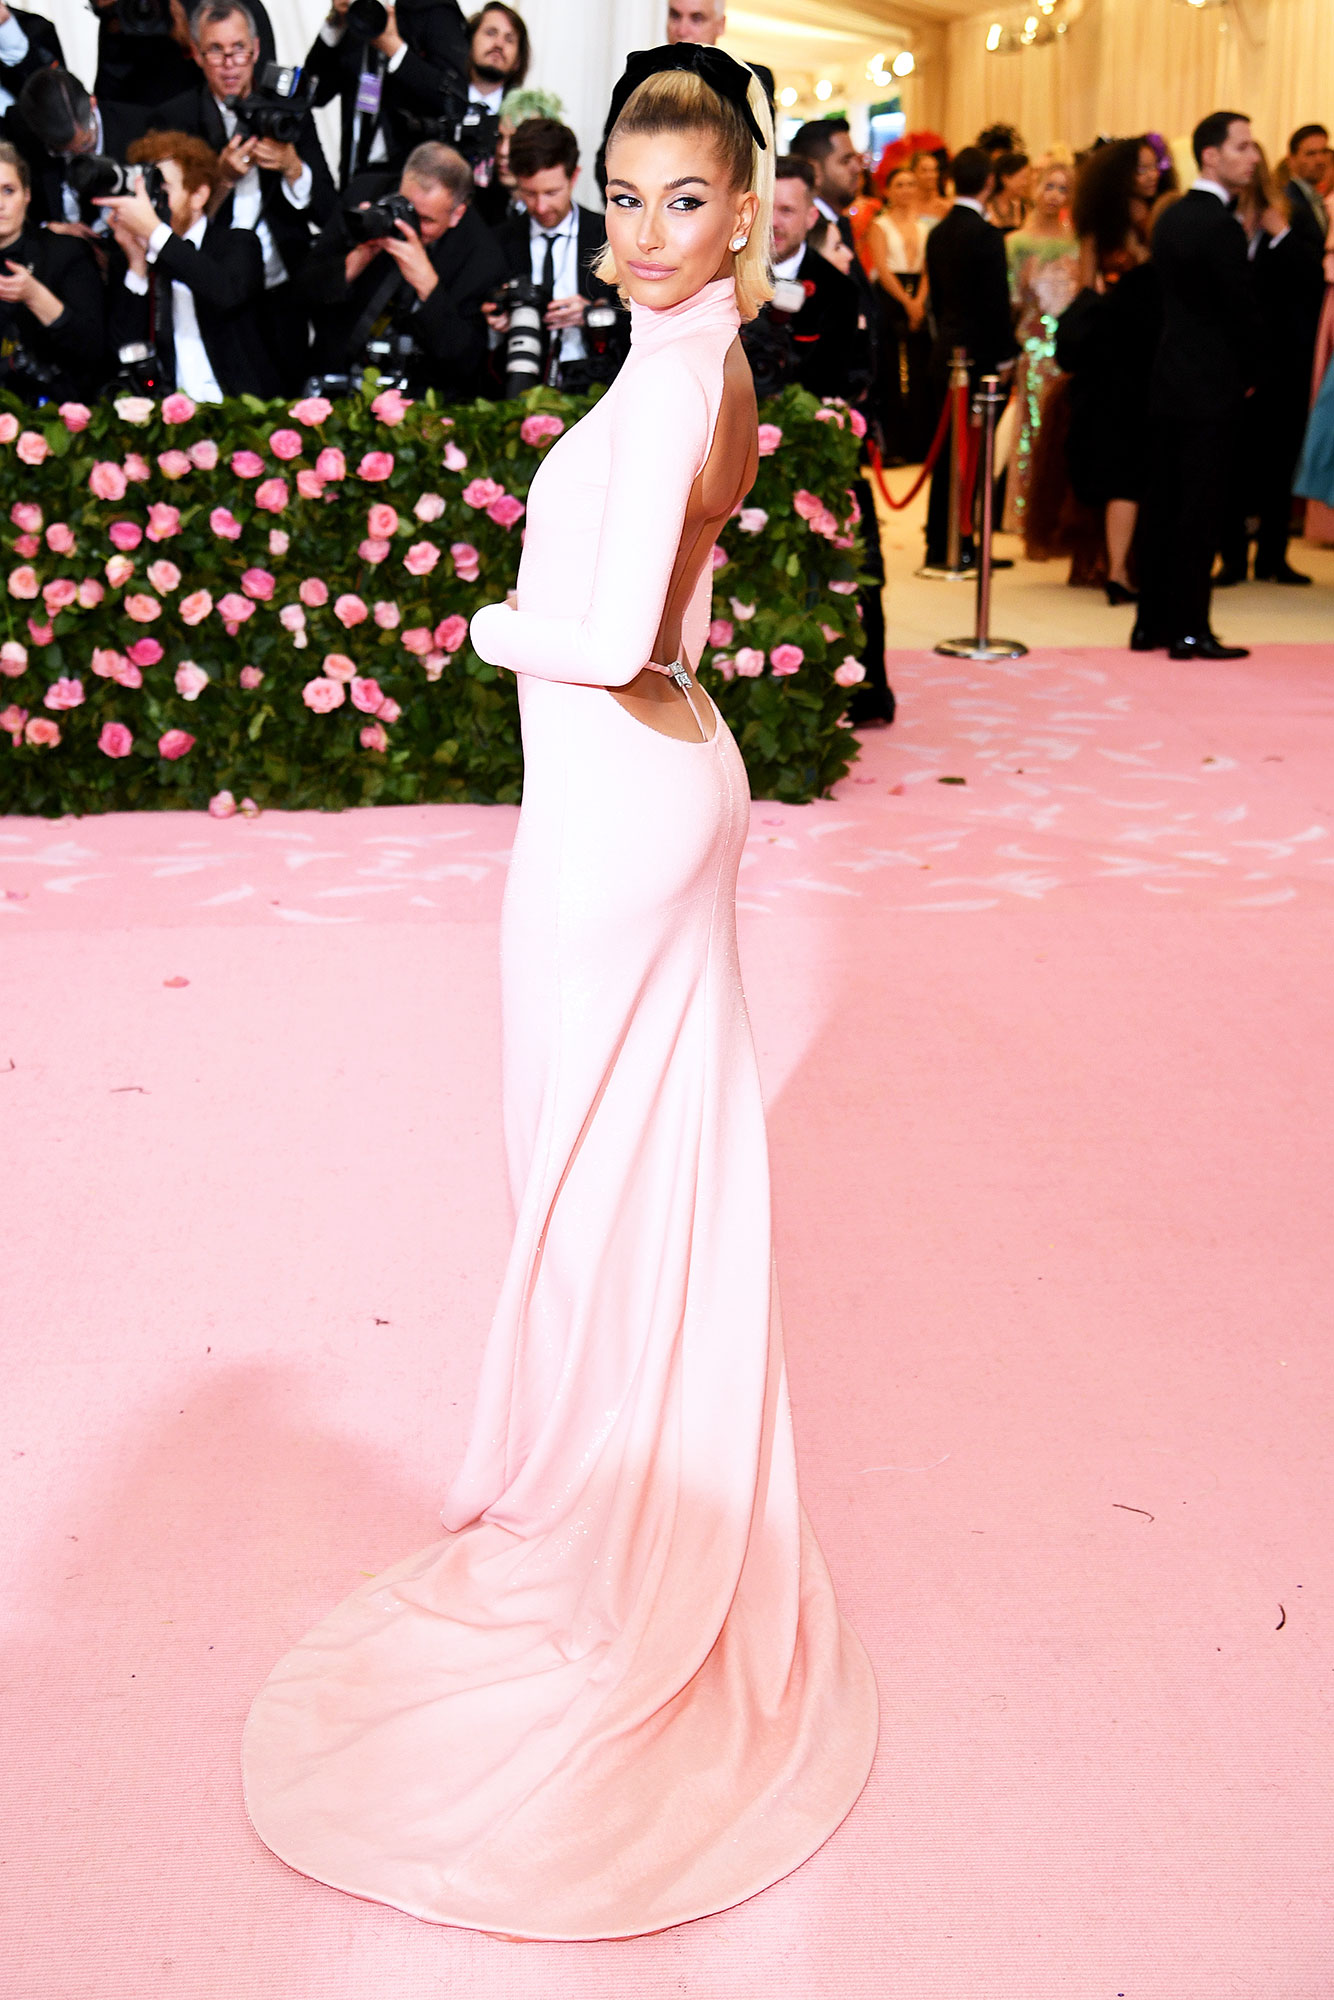 Hailey Bieber met gala 2019 - Wearing a pink Alexander Wang gown with Stuart Weitzman heels and Bulgari jewels.